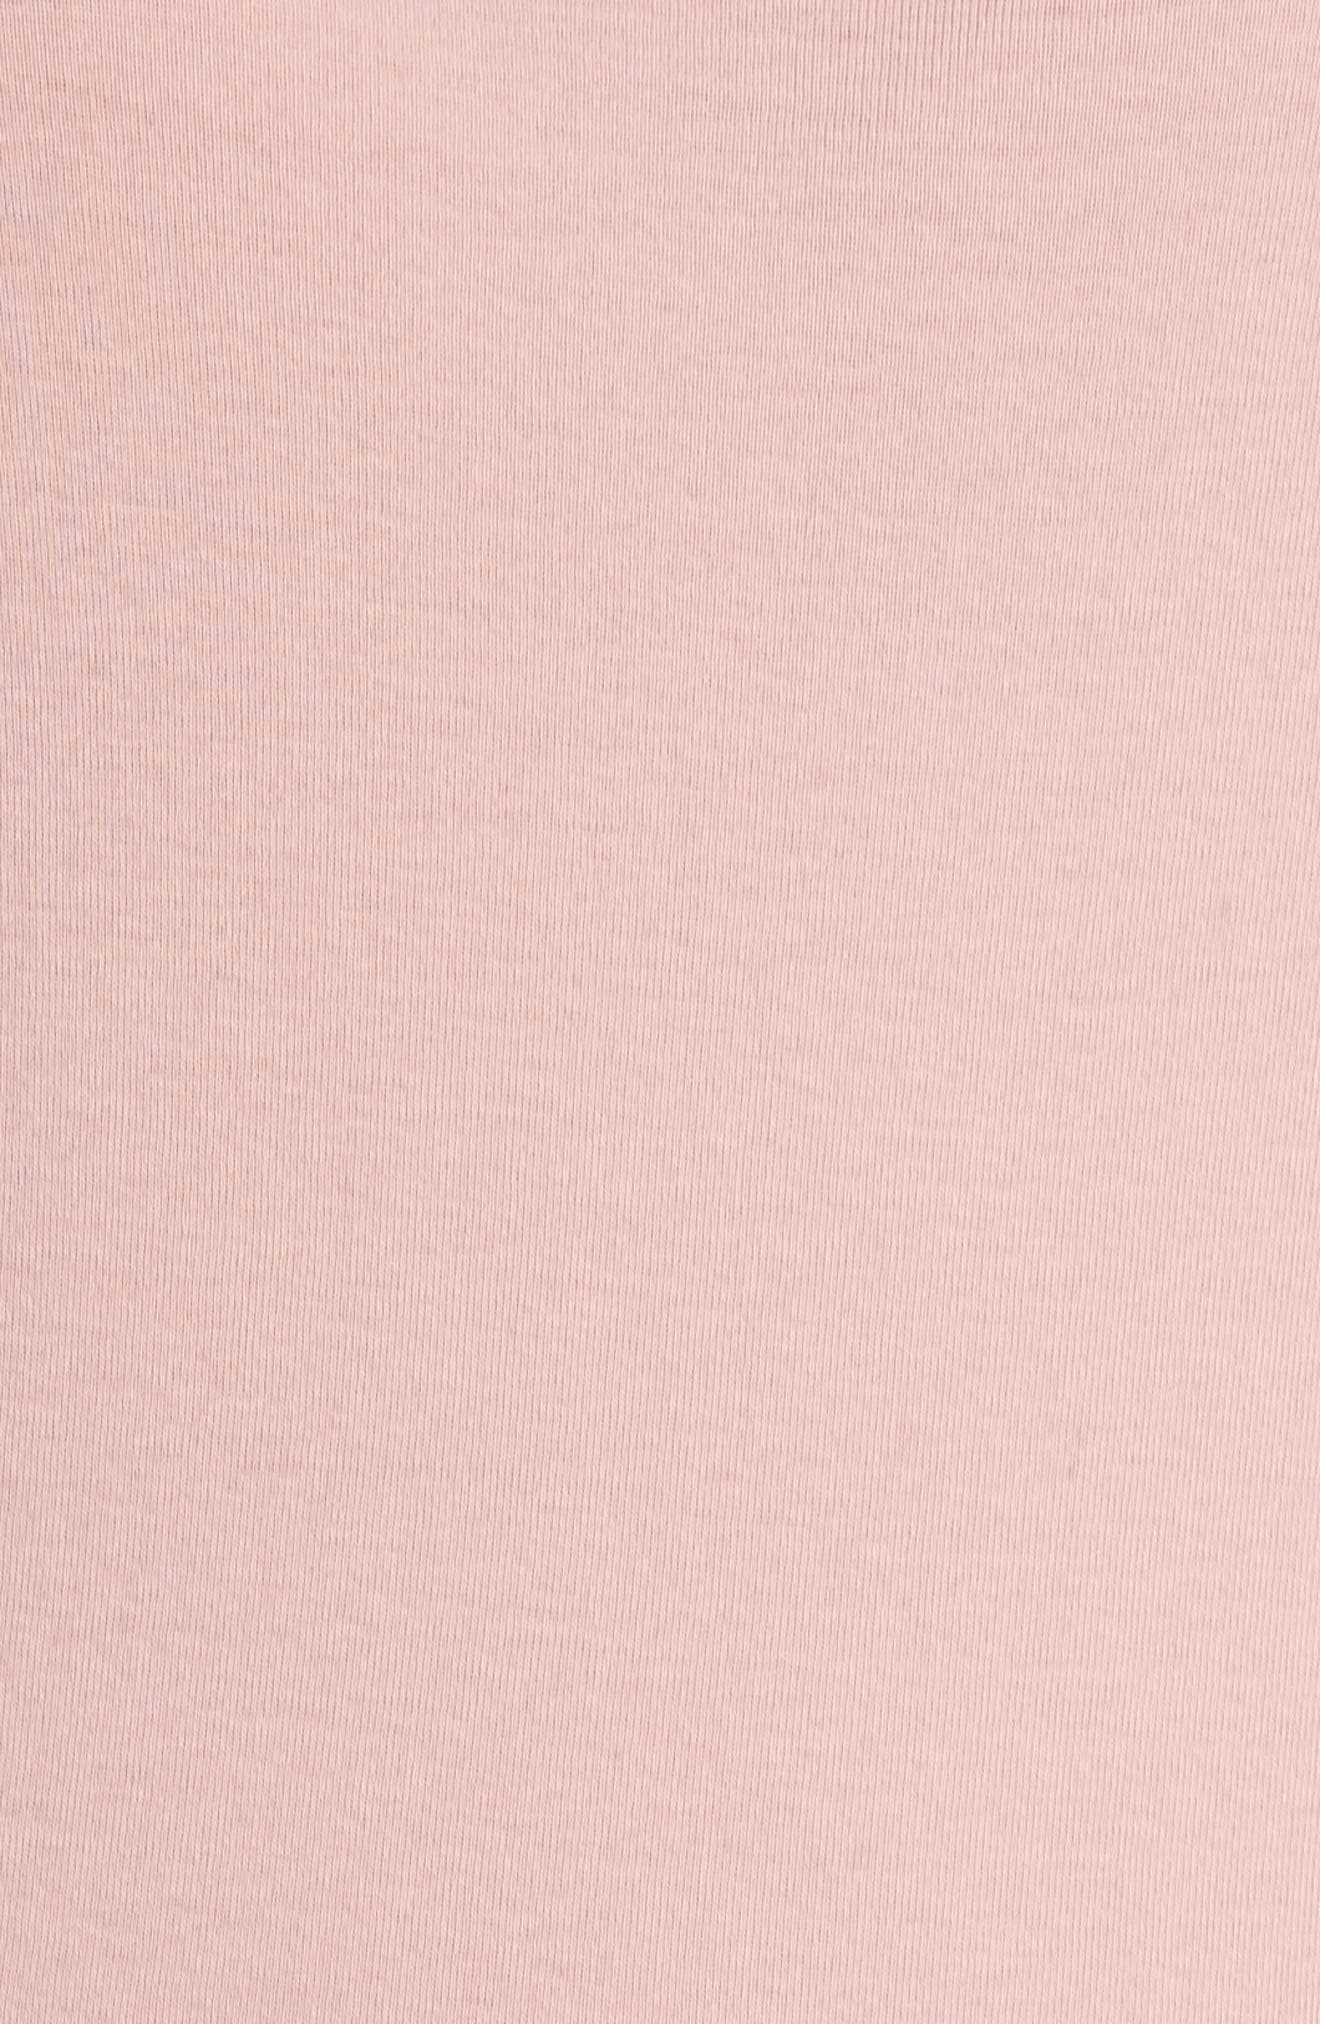 Ruffle Sleeve Sweatshirt,                             Alternate thumbnail 6, color,                             Antique Rose